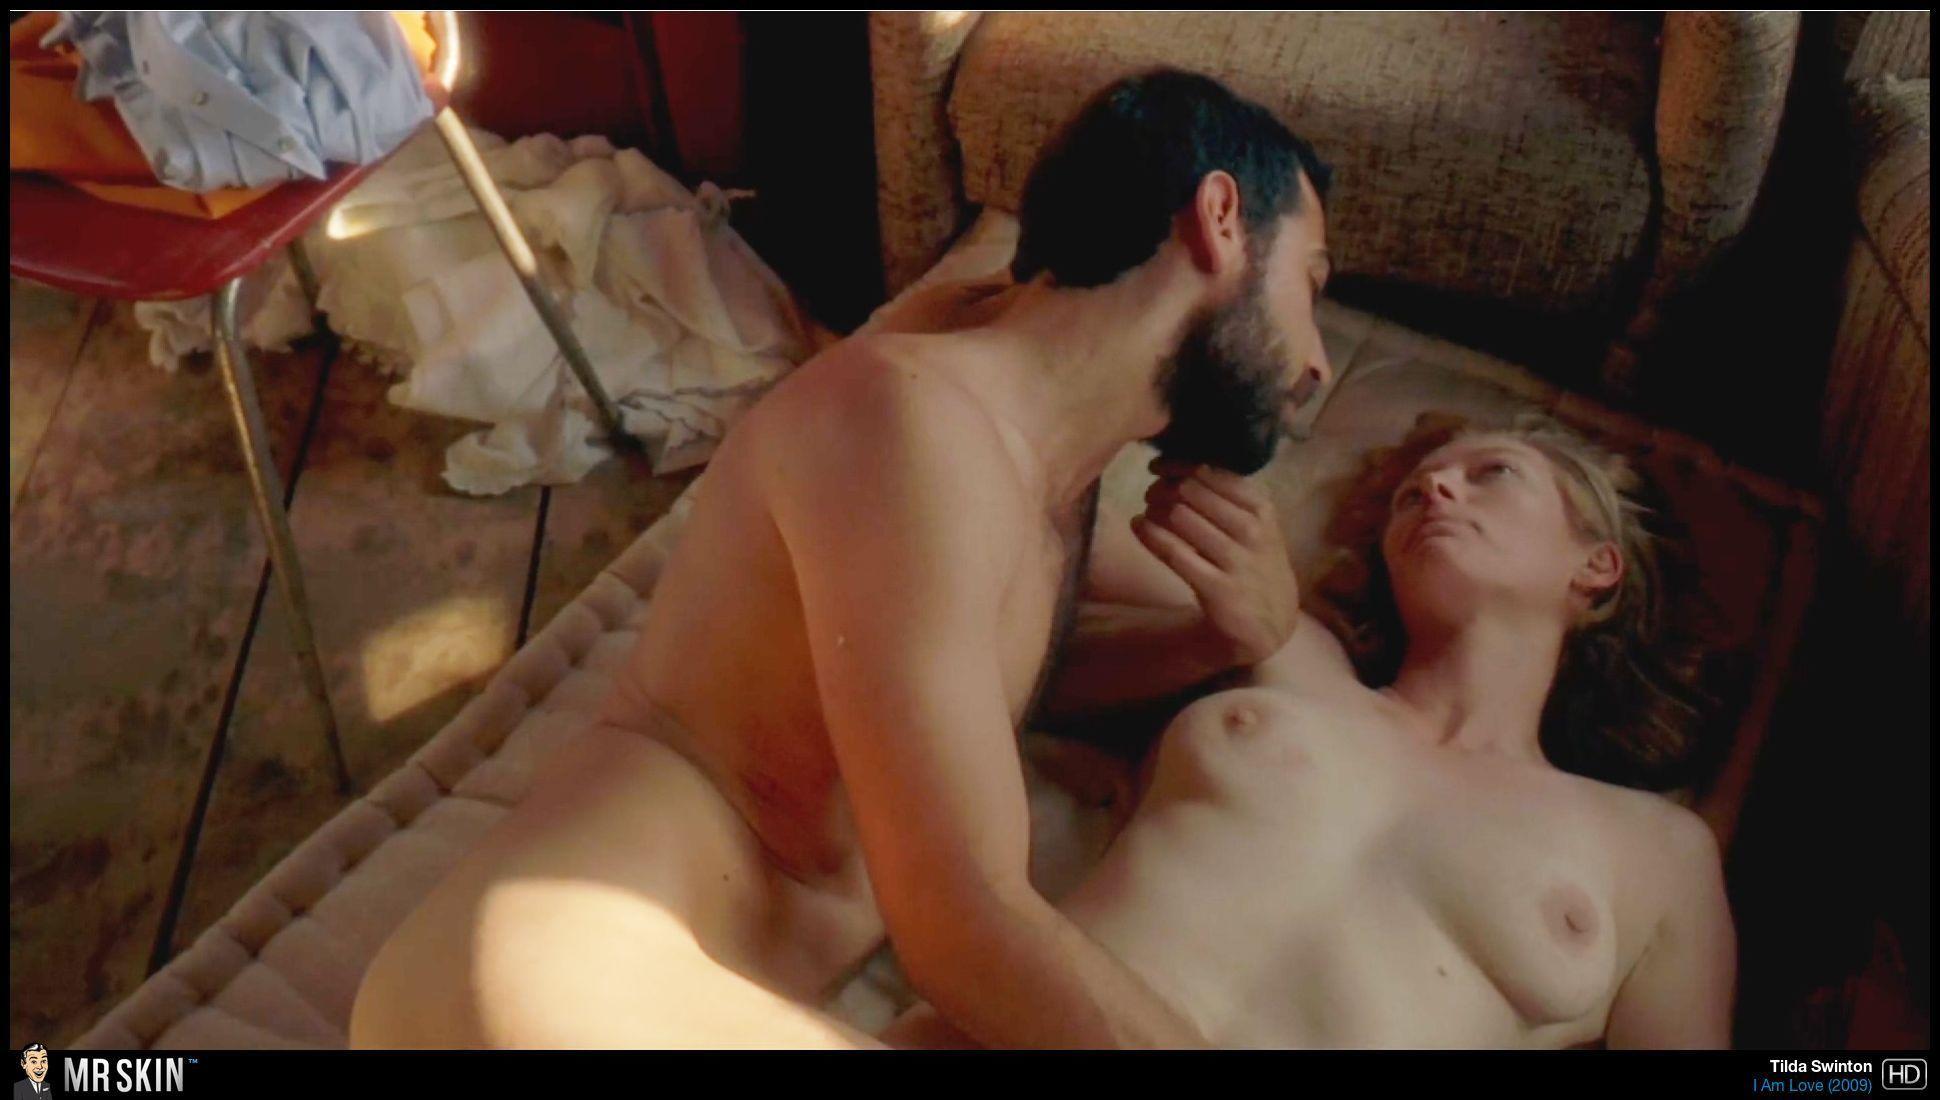 otkrovennie-otrivki-s-russkih-kinofilmov-negri-ustroili-drochku